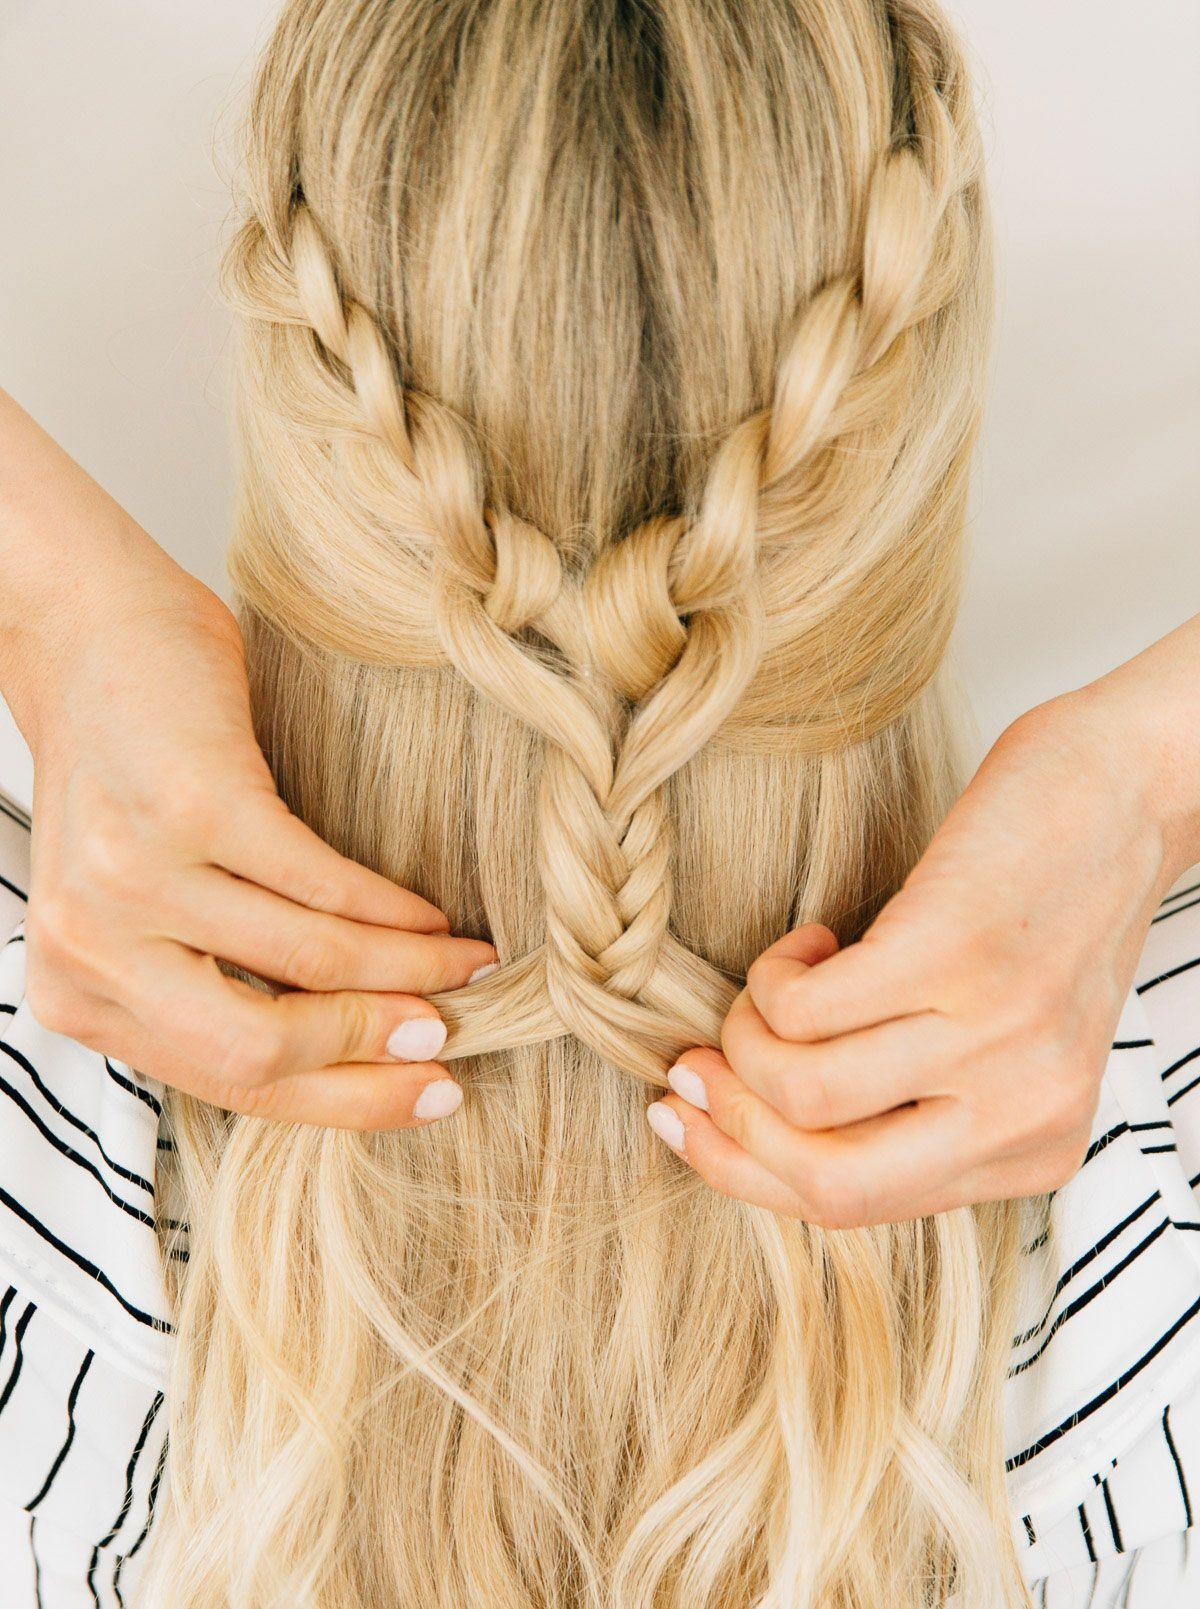 Beautiful Braid Hairstyles That Ll Liven Up Your Hair Routine Medium Hair Styles Braided Hairstyles Easy Braids For Long Hair